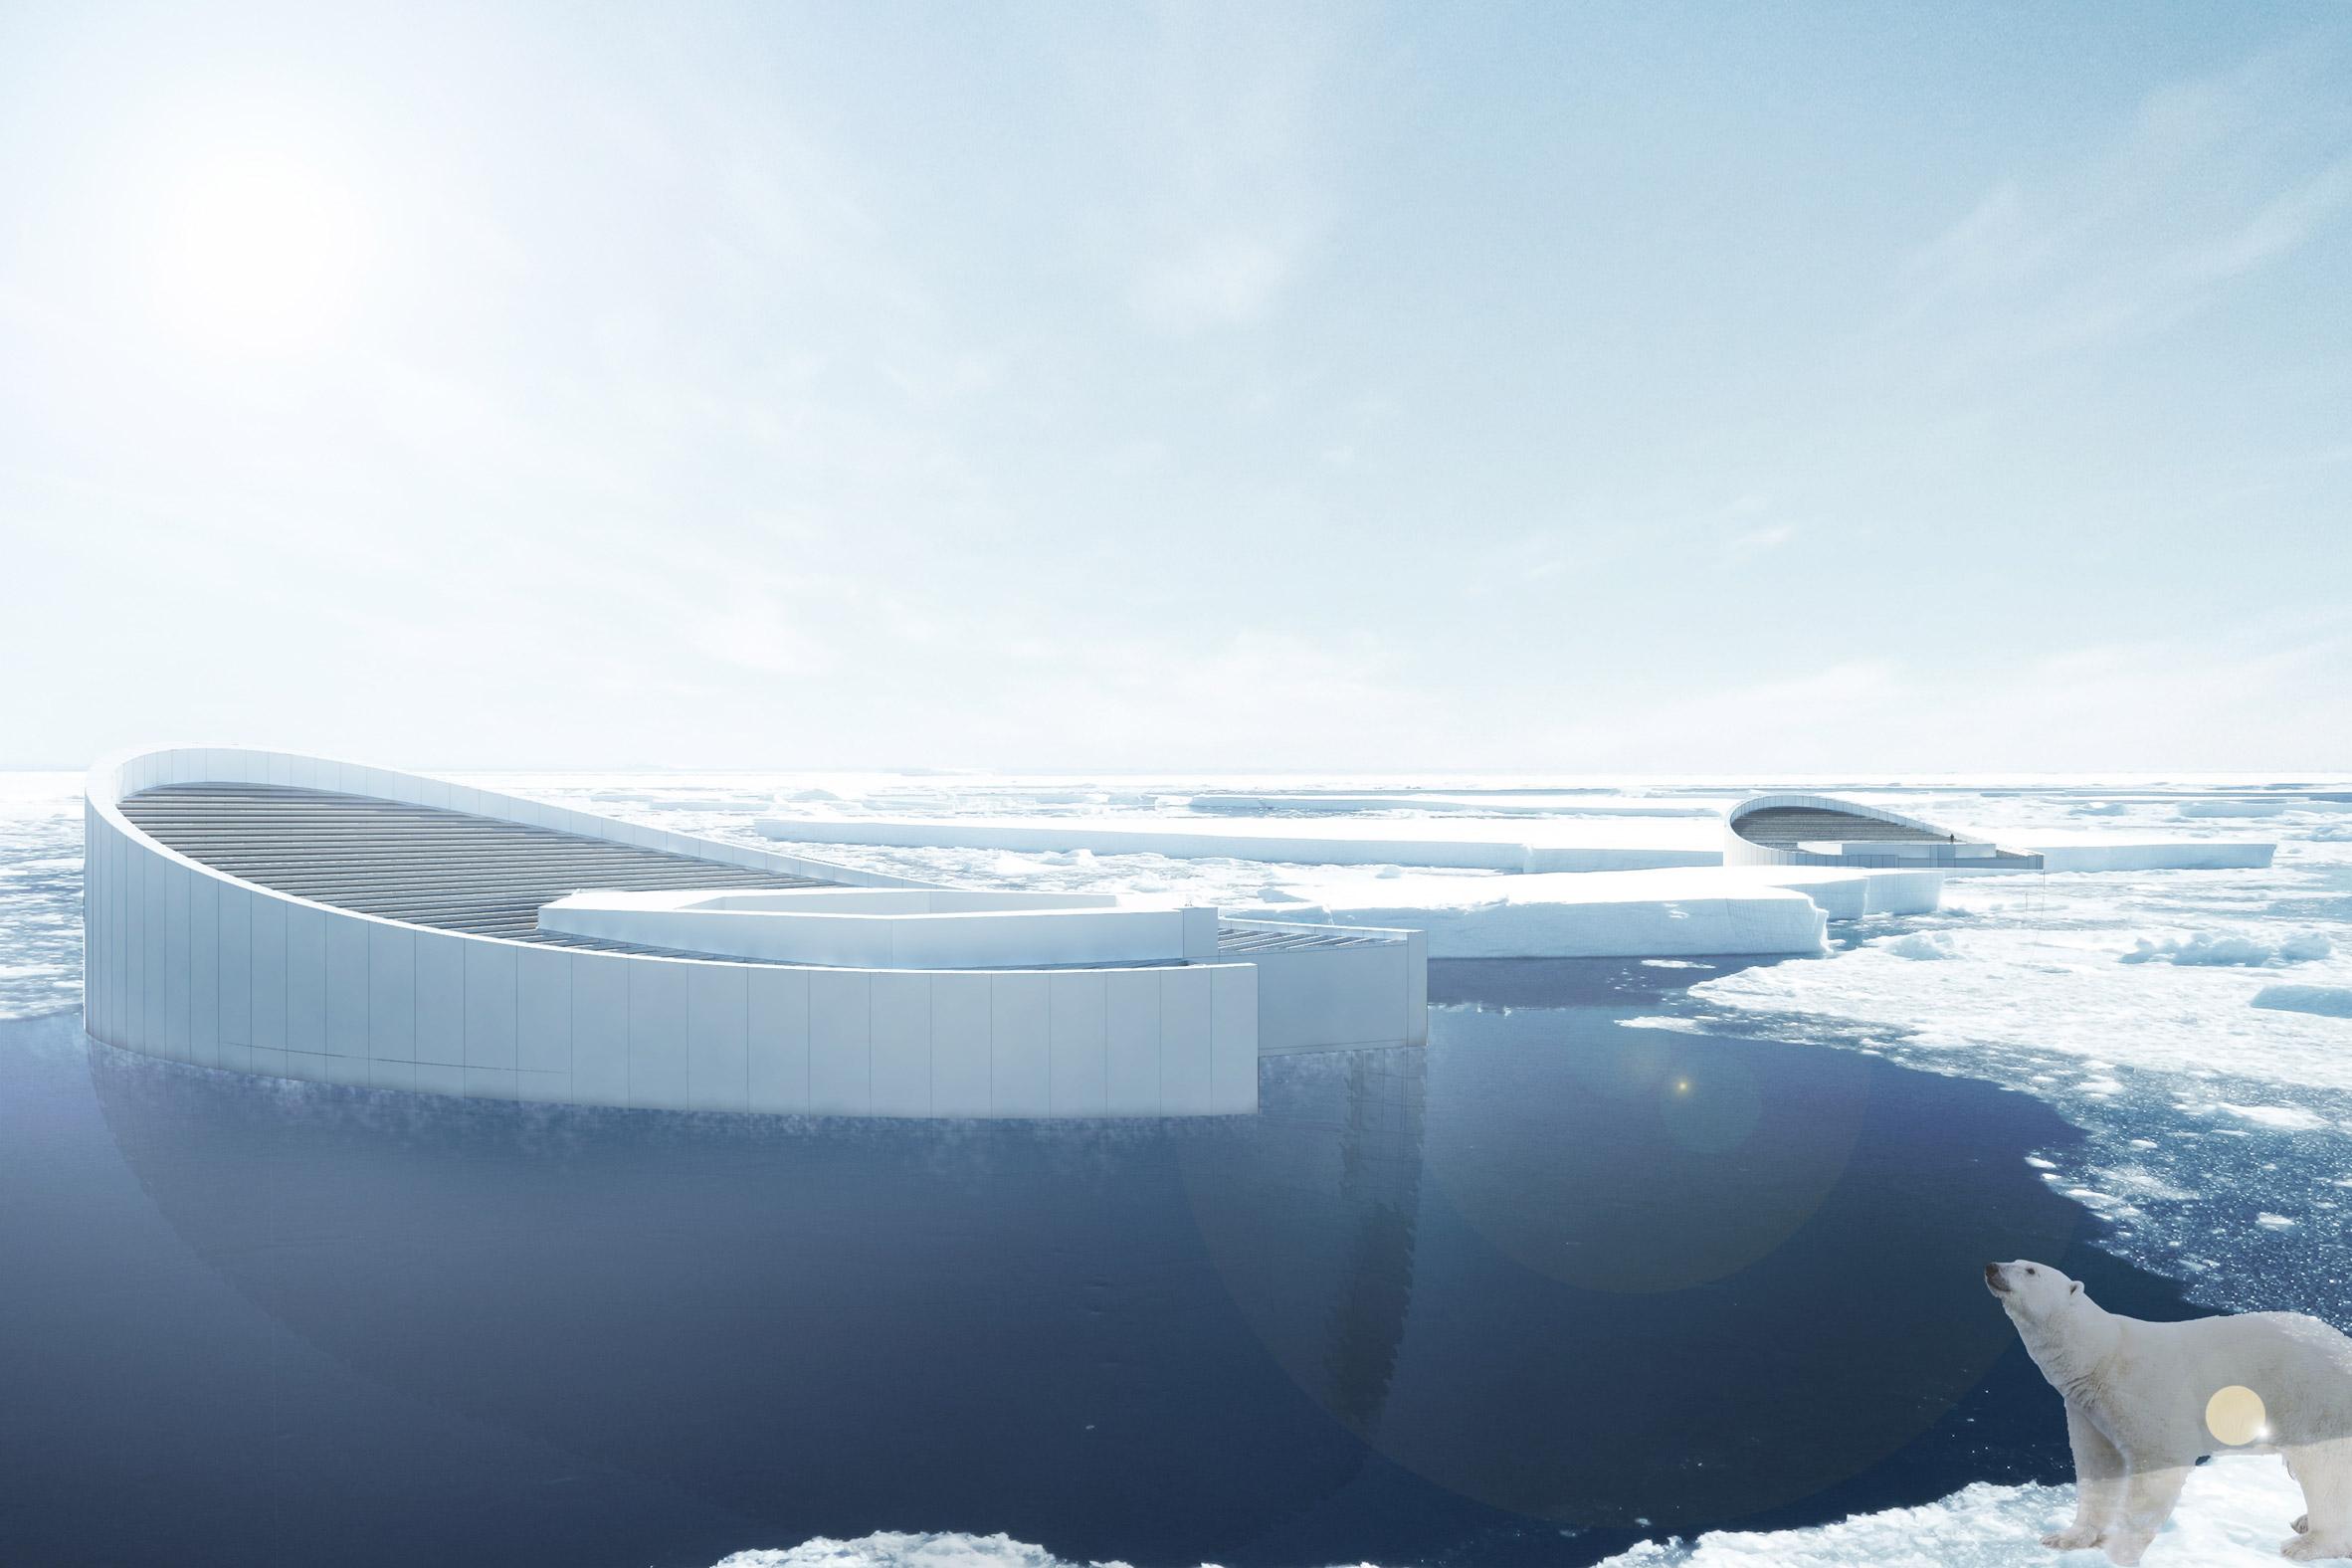 refreeze-the-arctic-faris-kota-design-technology-climate-change_dezeen_2364_col_1